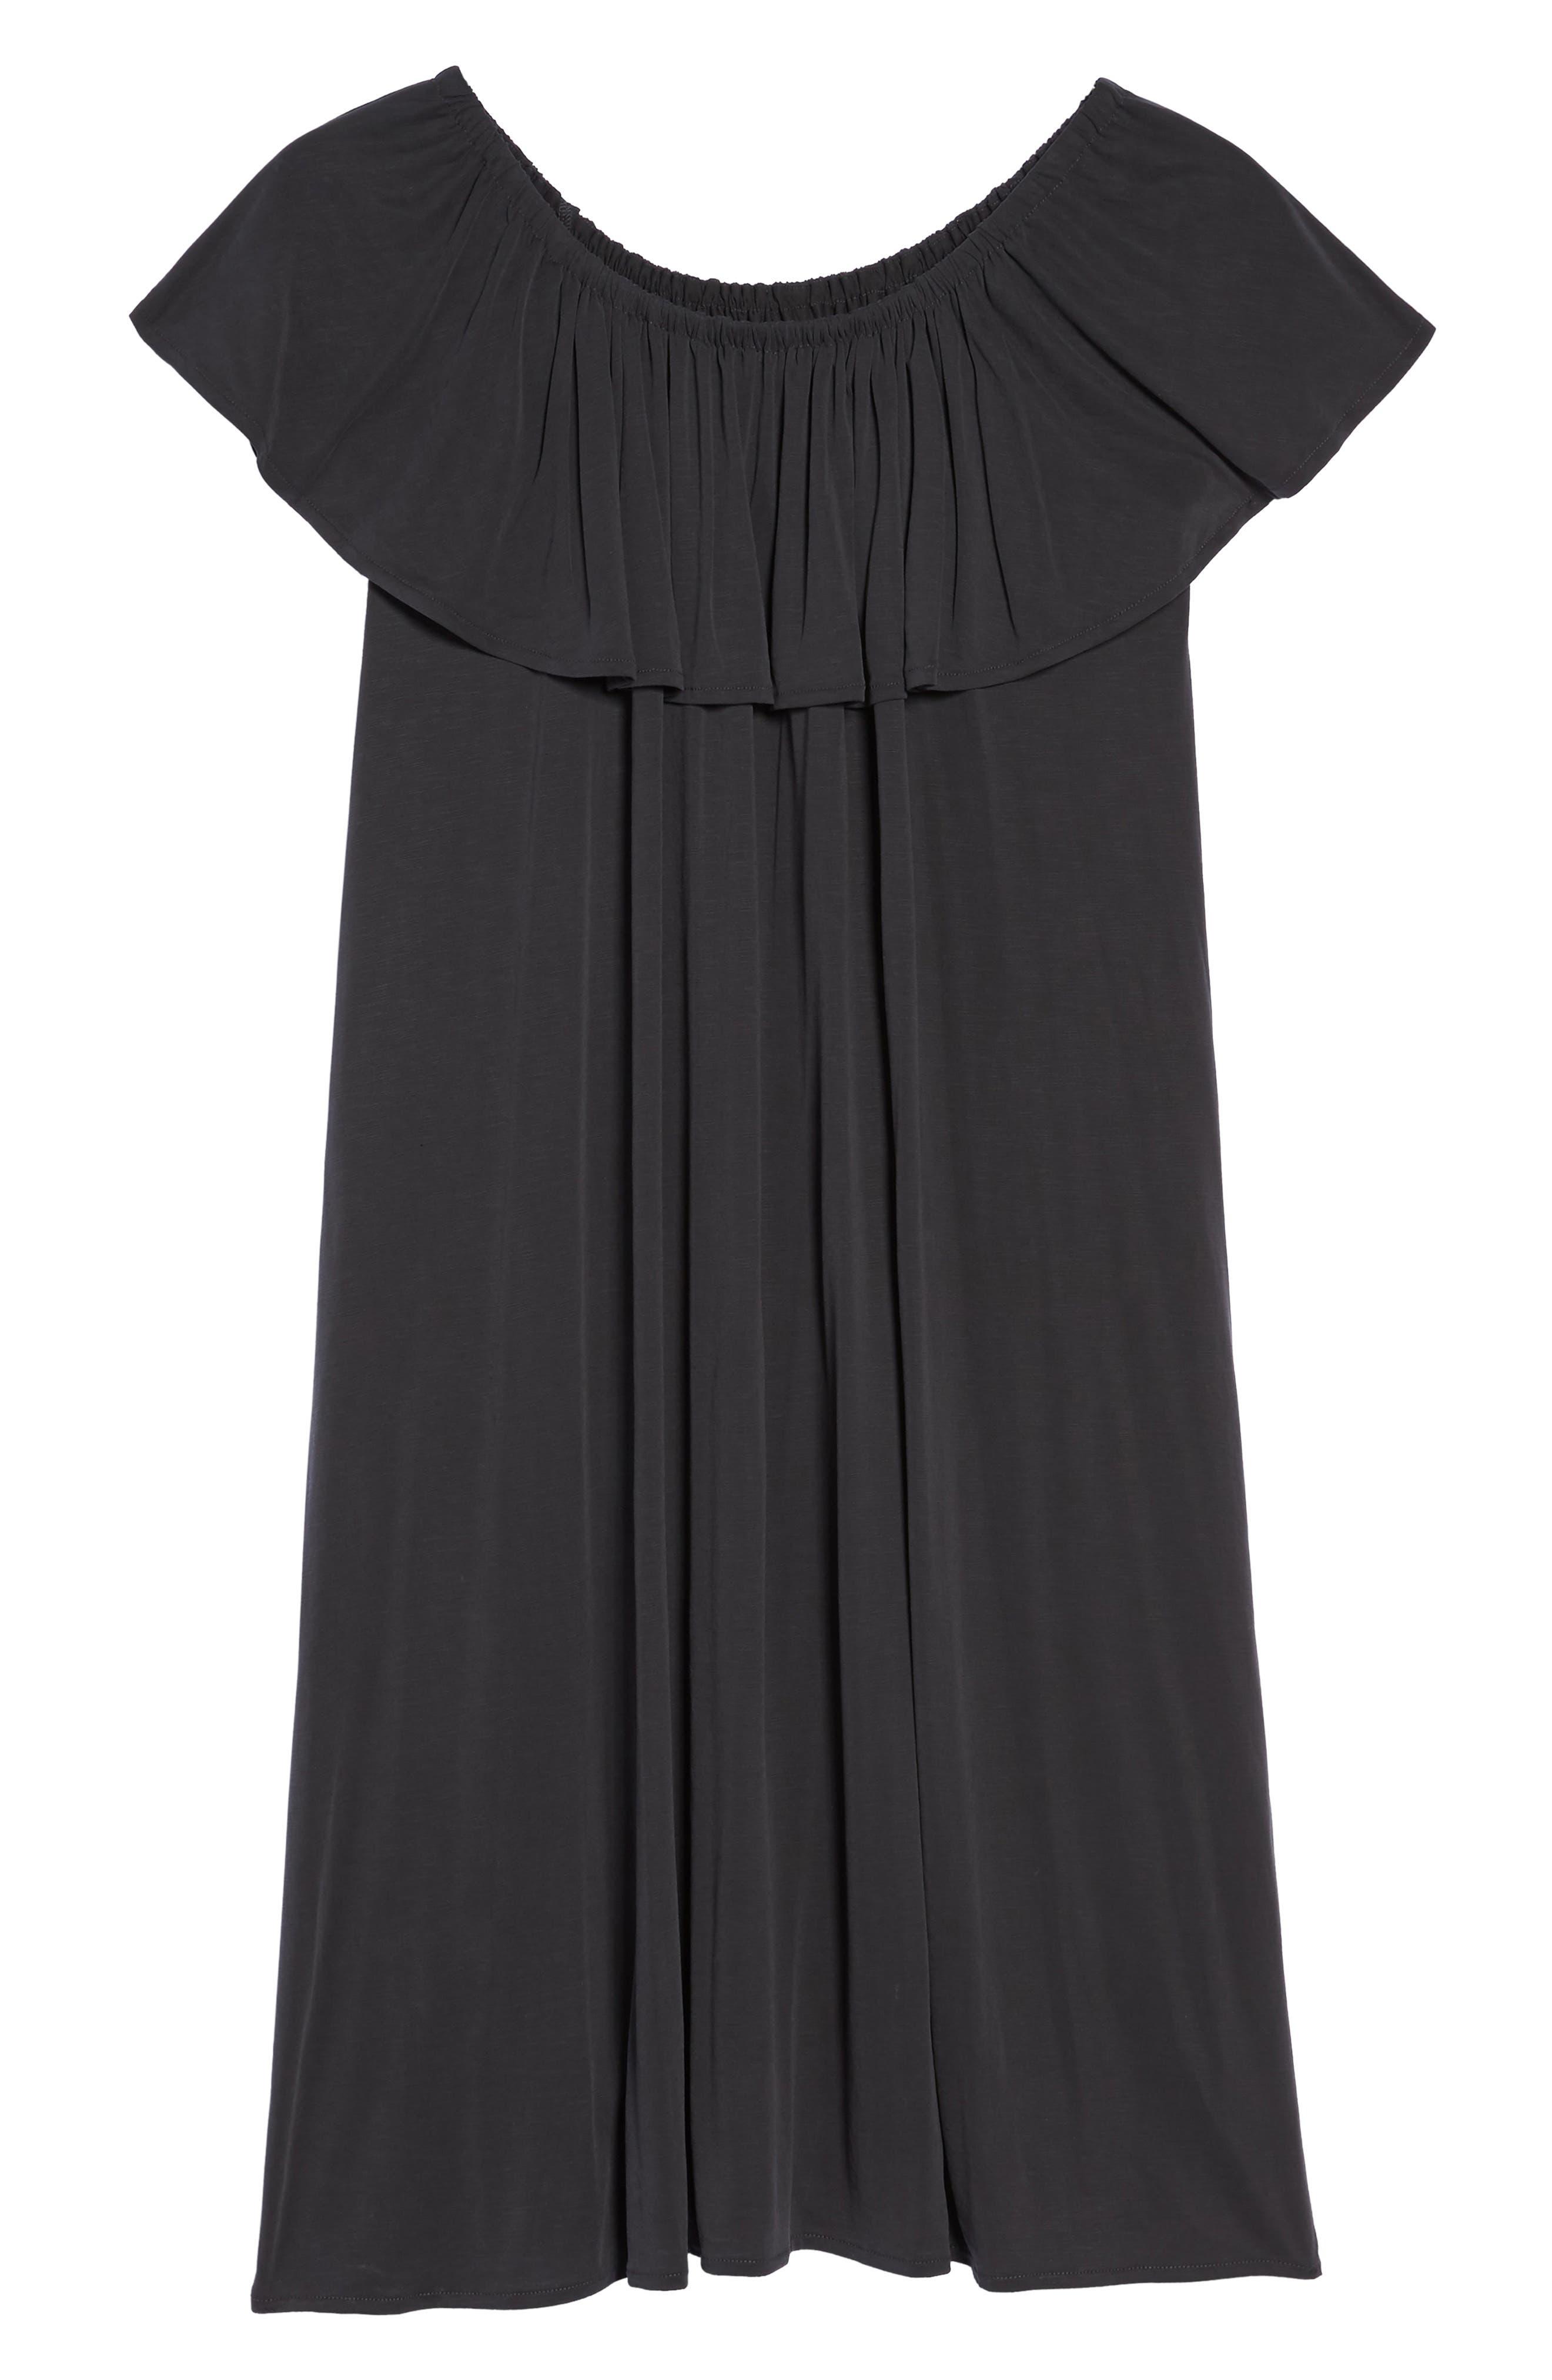 Boardwalk Convertible Jersey Dress,                             Alternate thumbnail 6, color,                             Washed Black